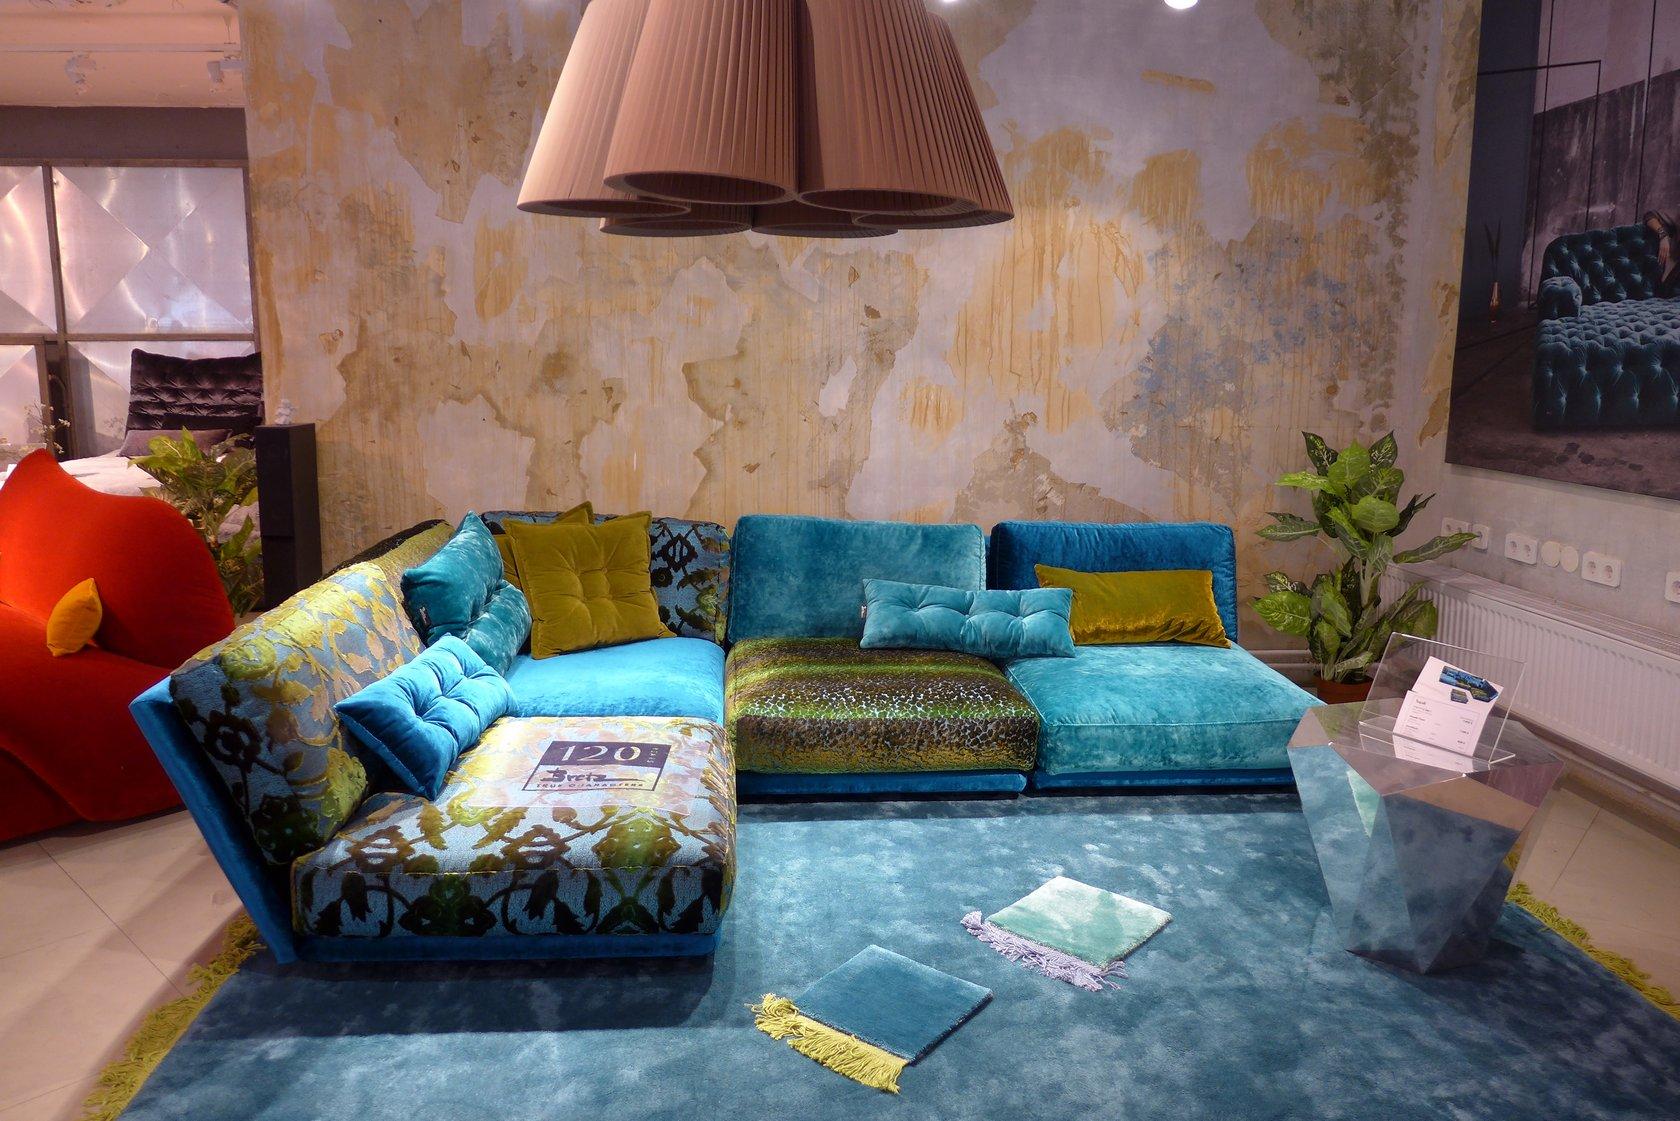 11 bretz store frankfurt designsofa napali bretz store frankfurt. Black Bedroom Furniture Sets. Home Design Ideas